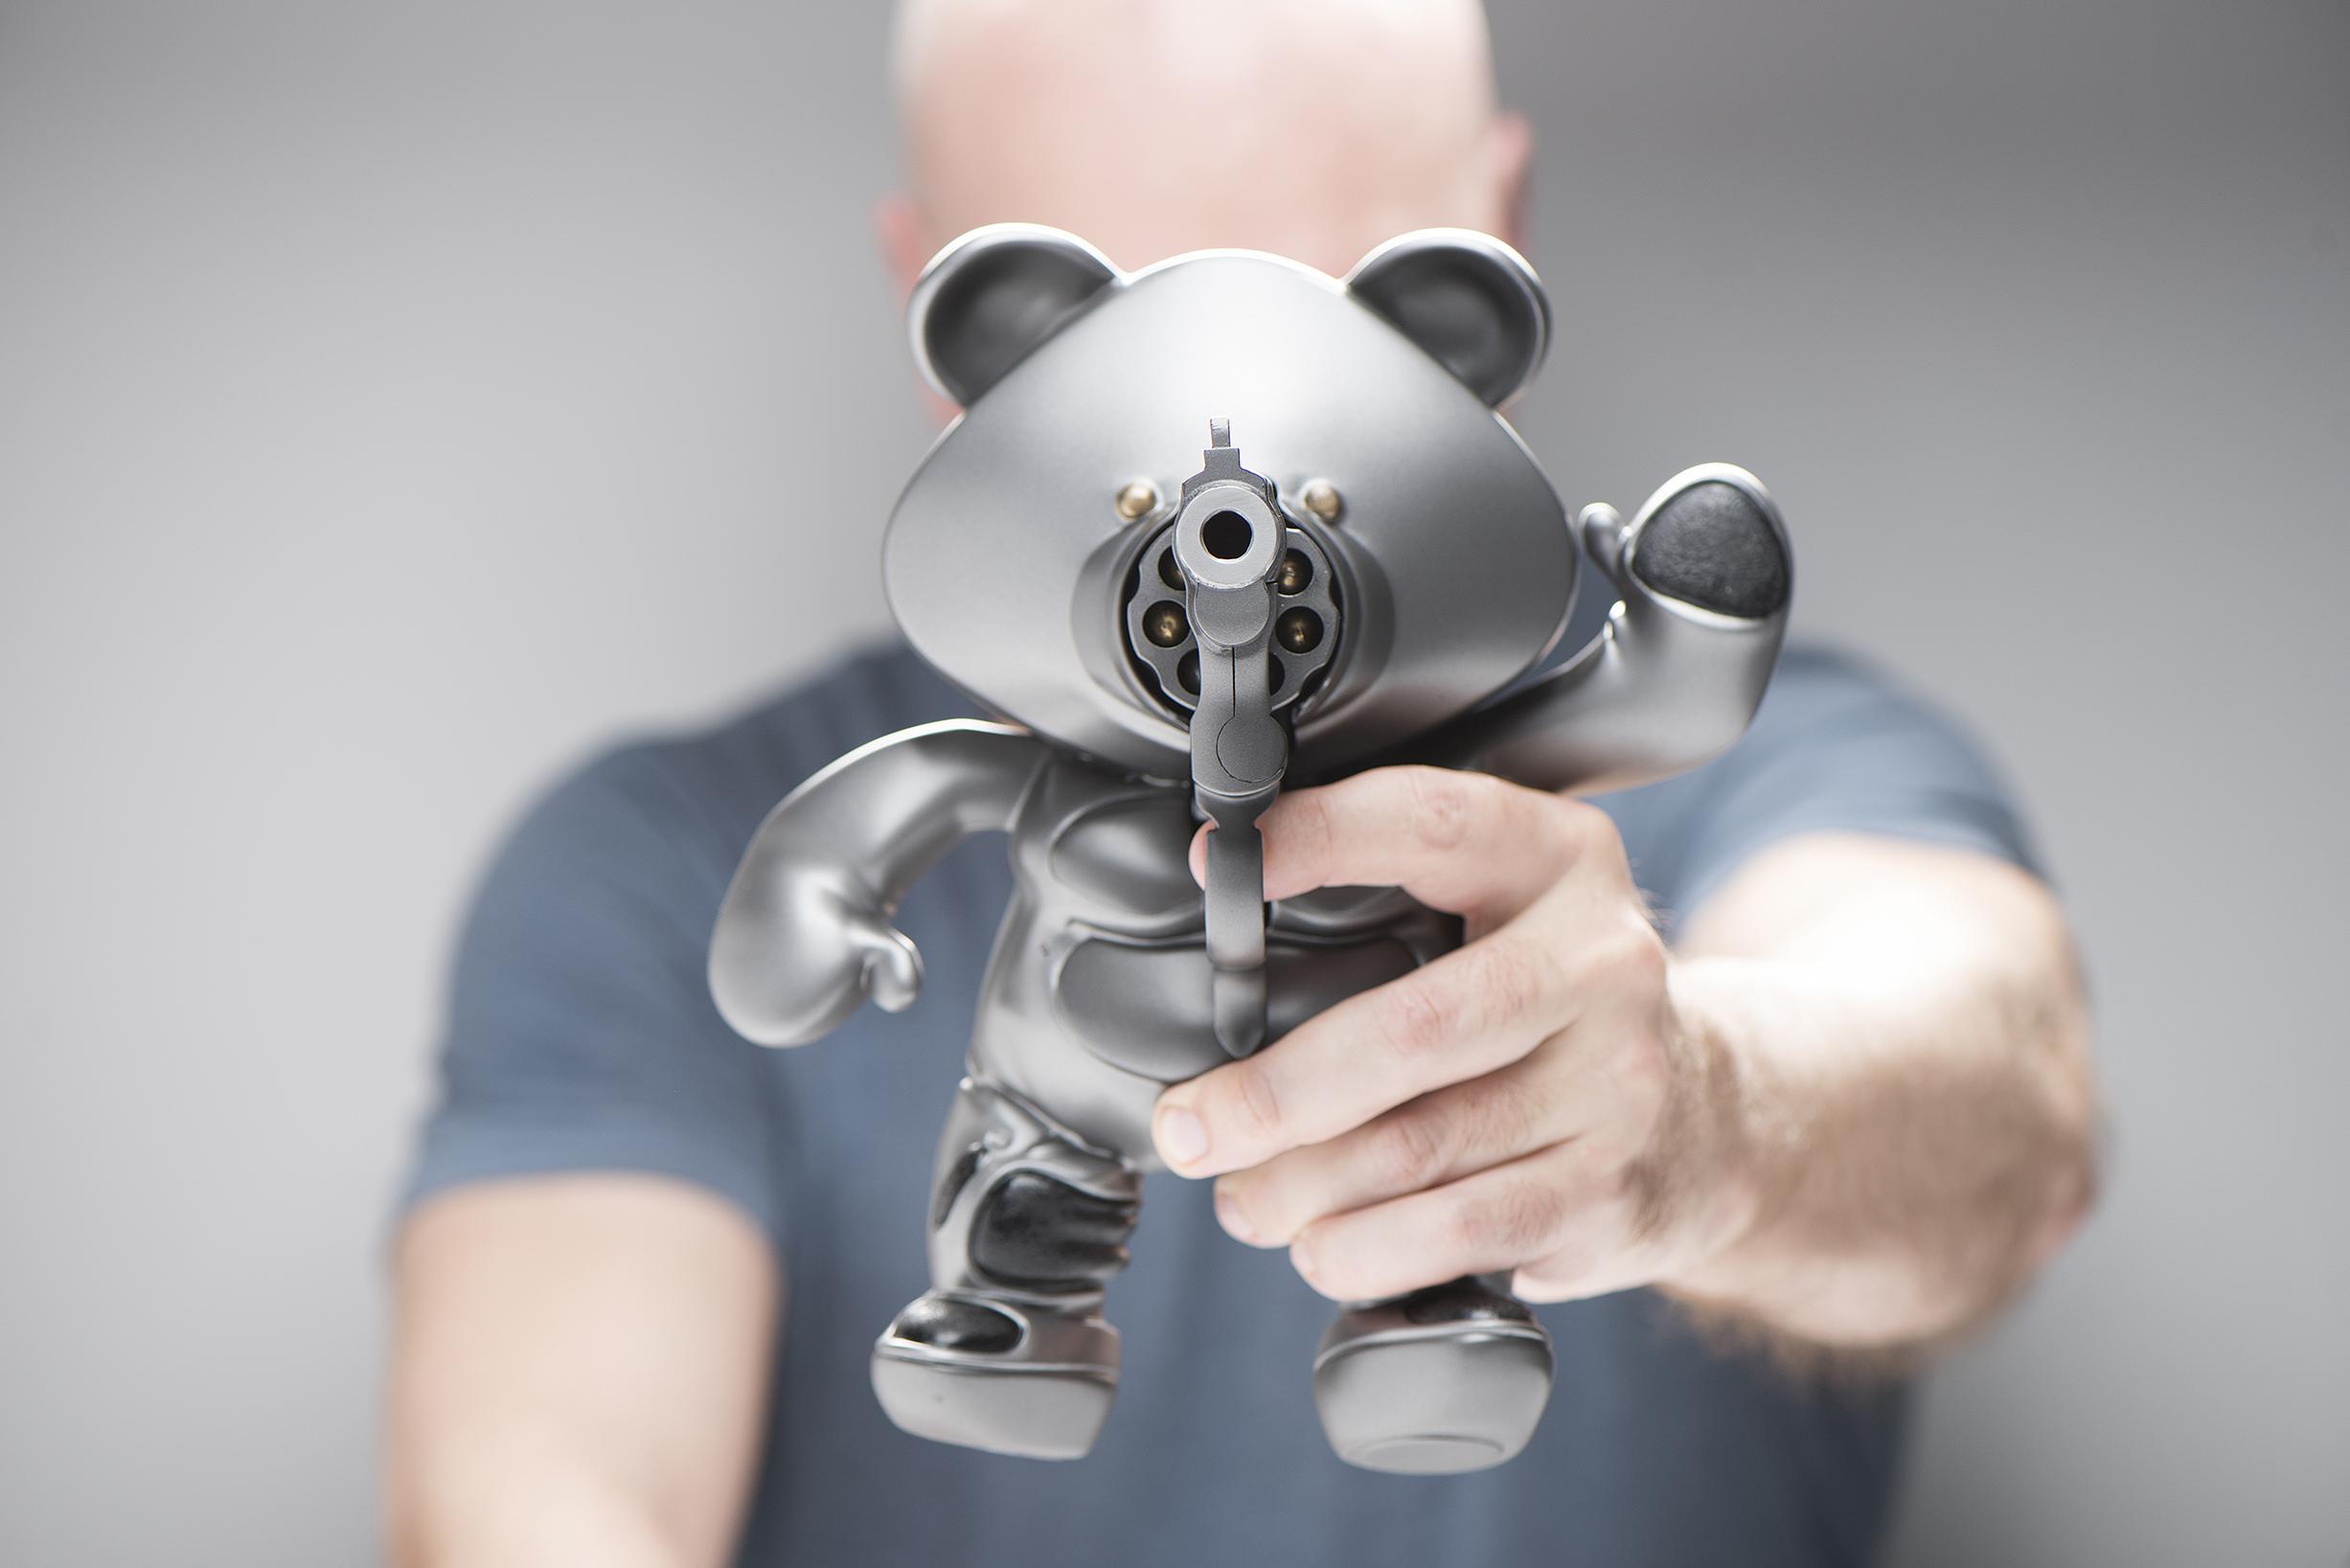 Illinois Council Against Handgun Violence Film Ad - Introducing Teddy Gun